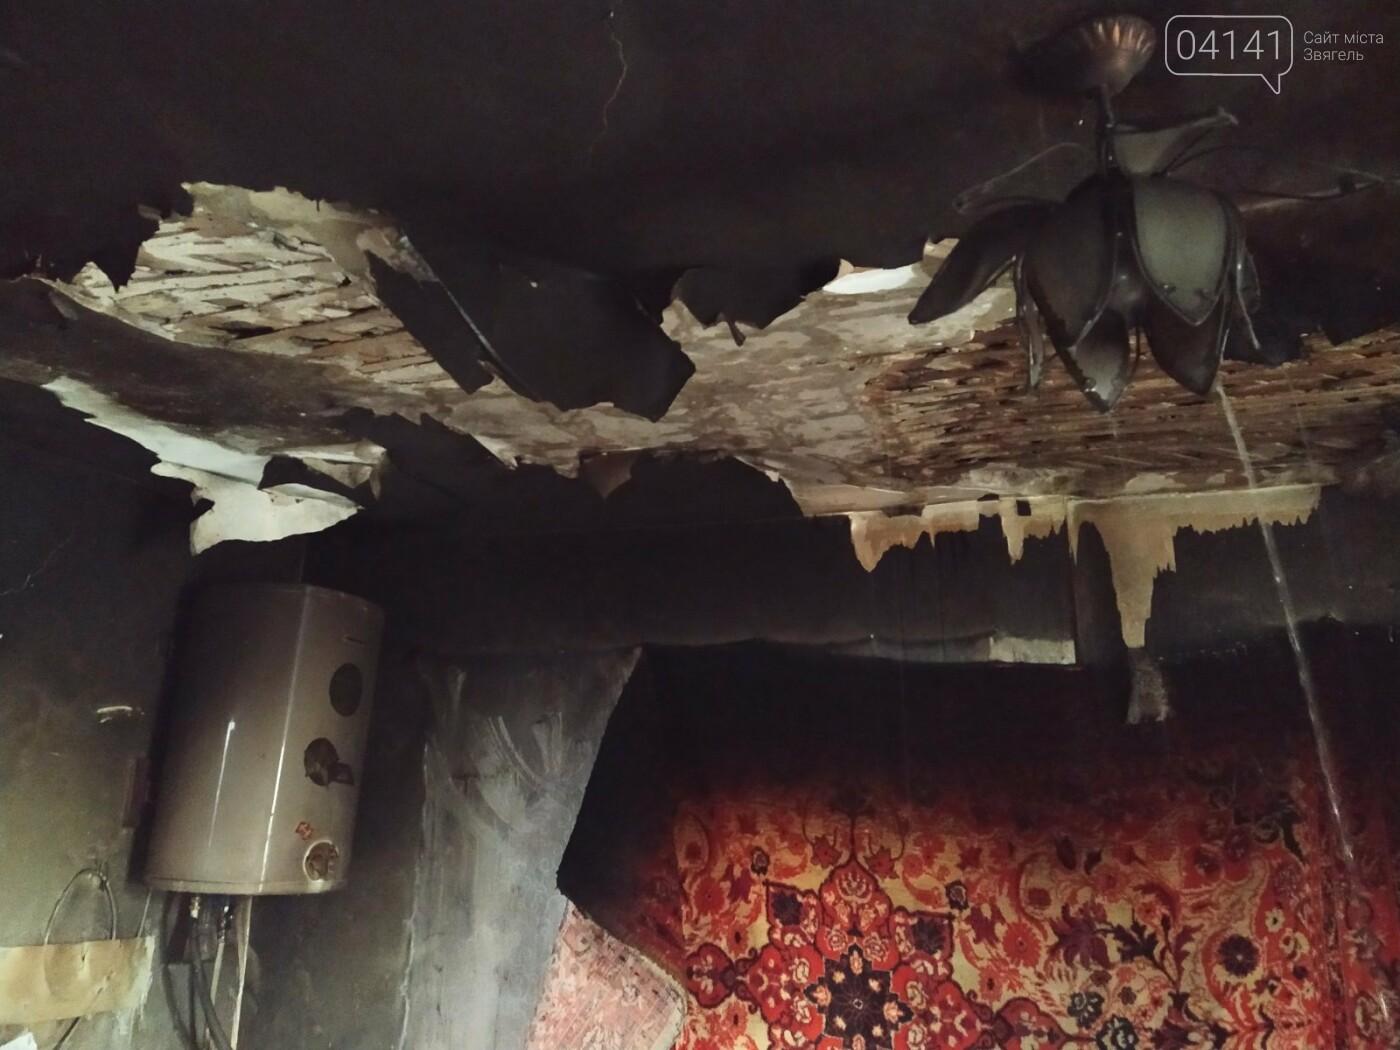 У Новограді-Волинському сталася пожежа в житловому будинку , фото-2